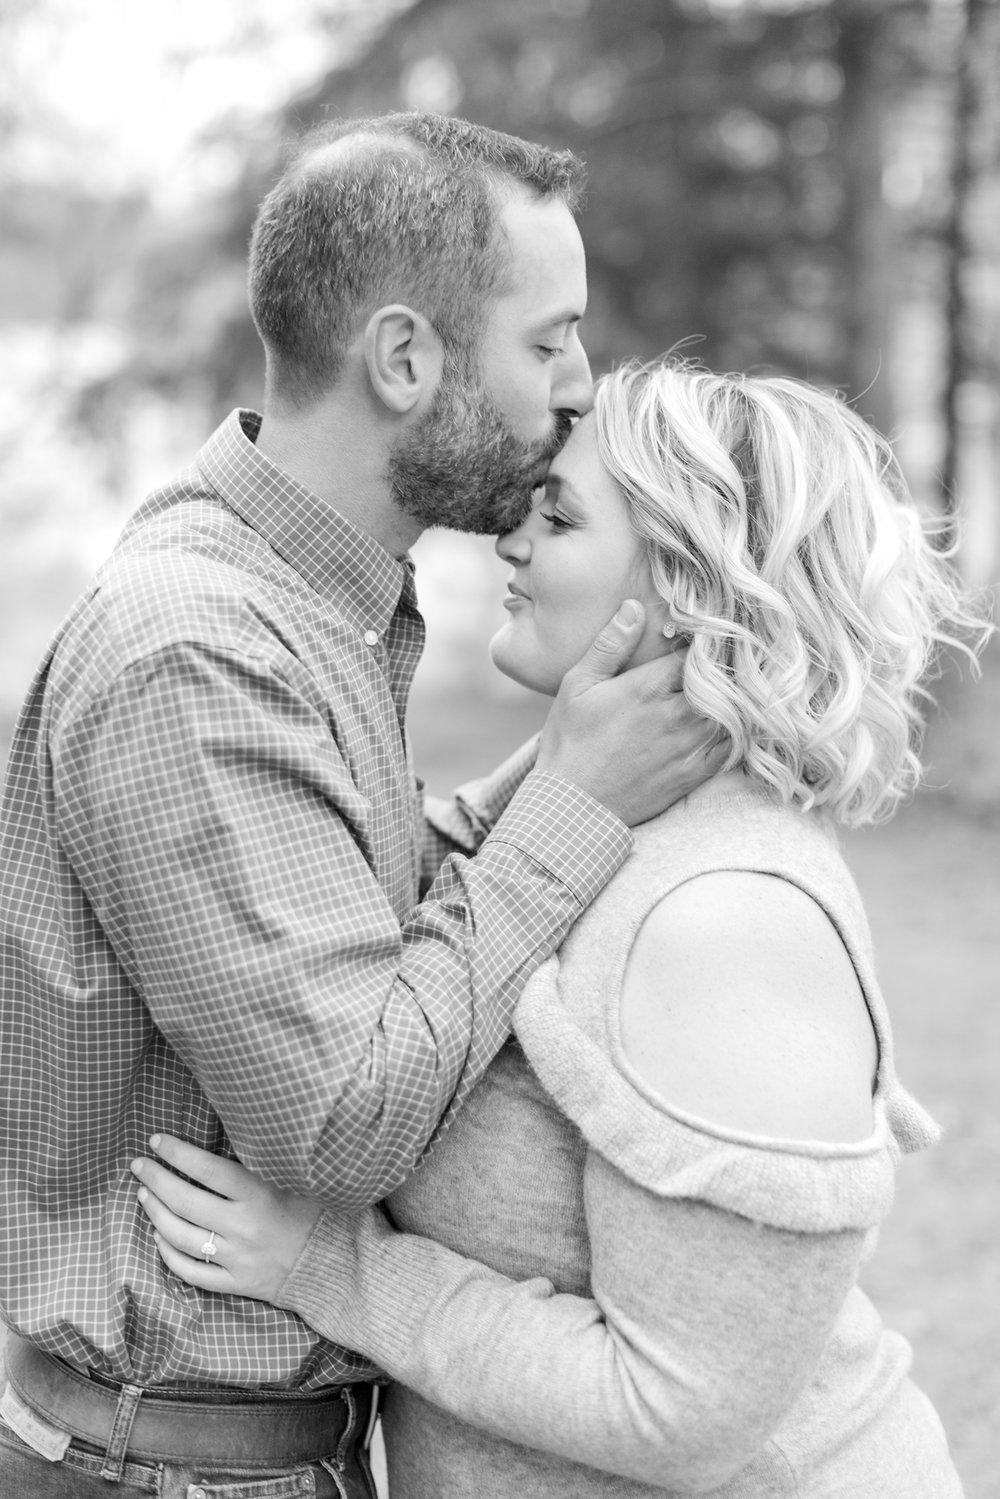 Emily Kordish & John Winkler Engagement-176_loch-raven-reservoir-baltimore-maryland-engagement-photography-anna-grace-photography-photo.jpg